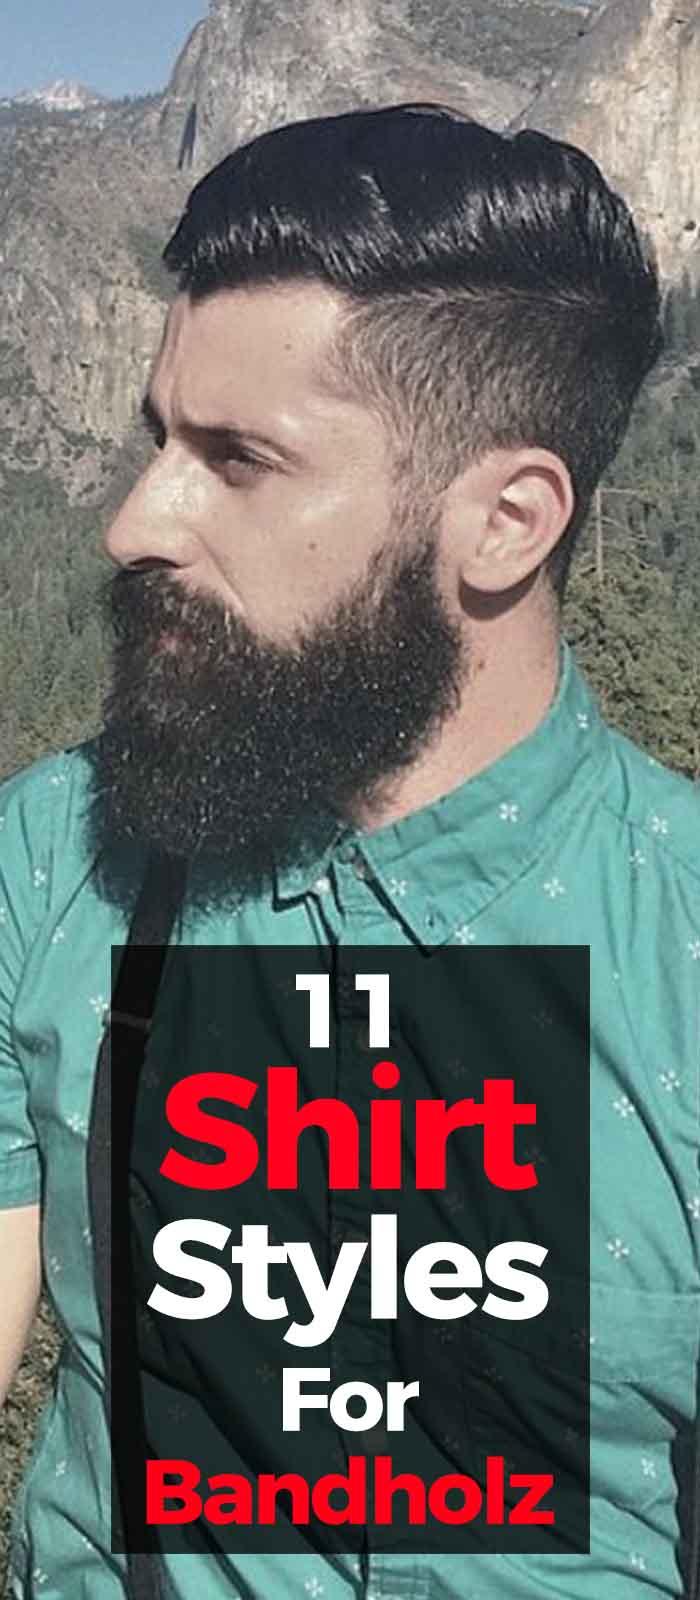 Ways to style your bandholz beard!